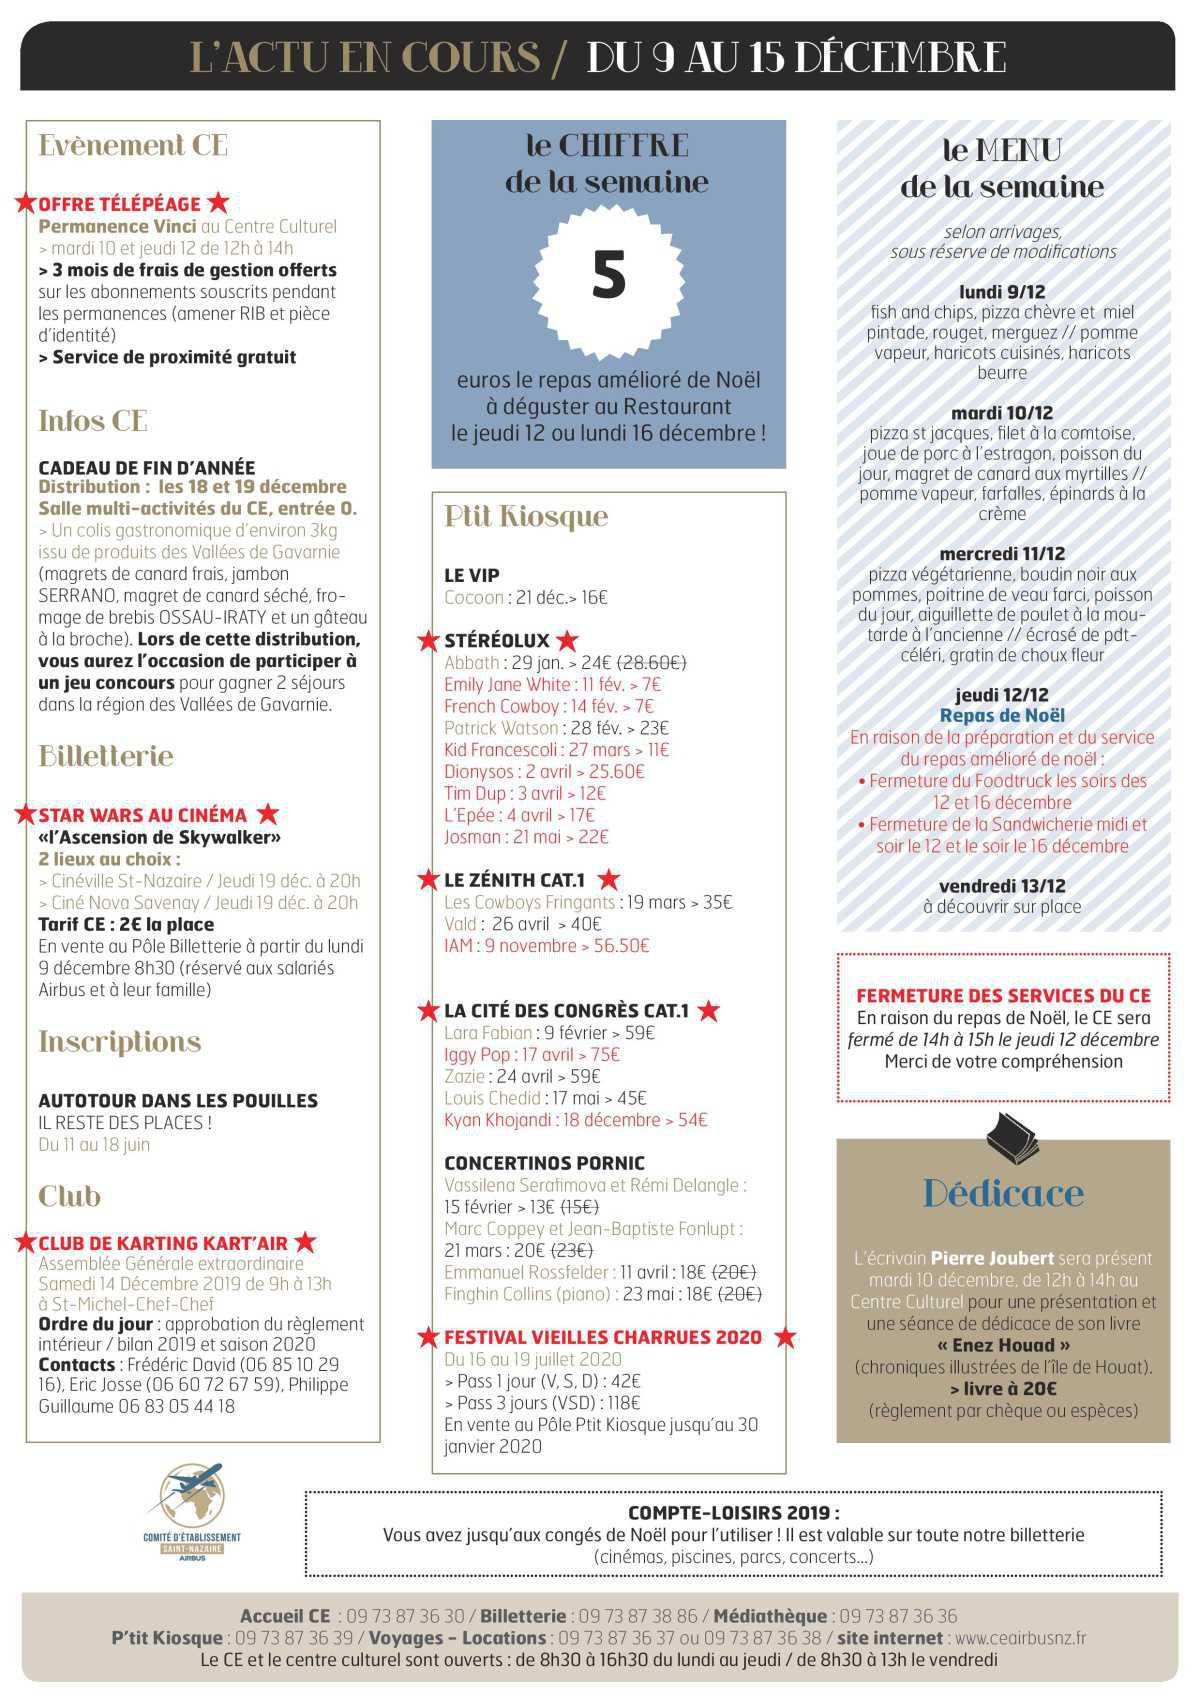 Infos CE/COOP Semaine 50